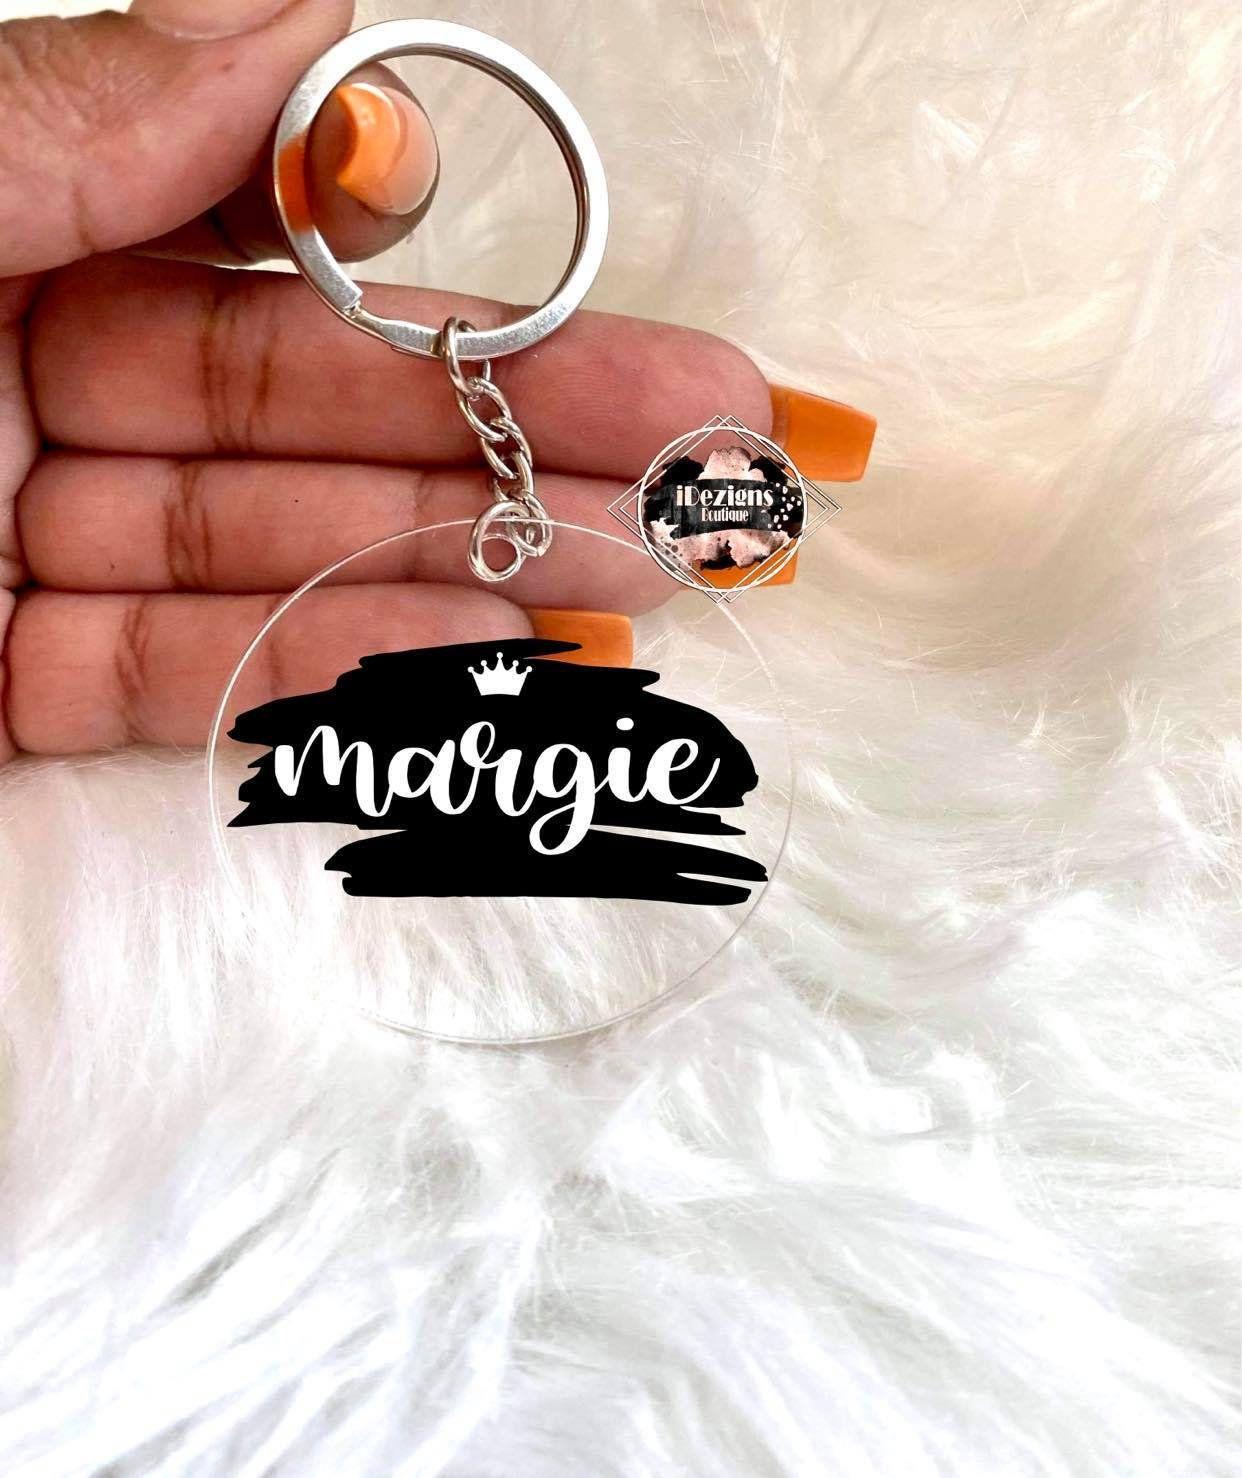 Keychain with Name Acrylic Blanks 2 inch Keychain Custom Keychain Great Gift for Someone Special Acrylic Keychain Personalized